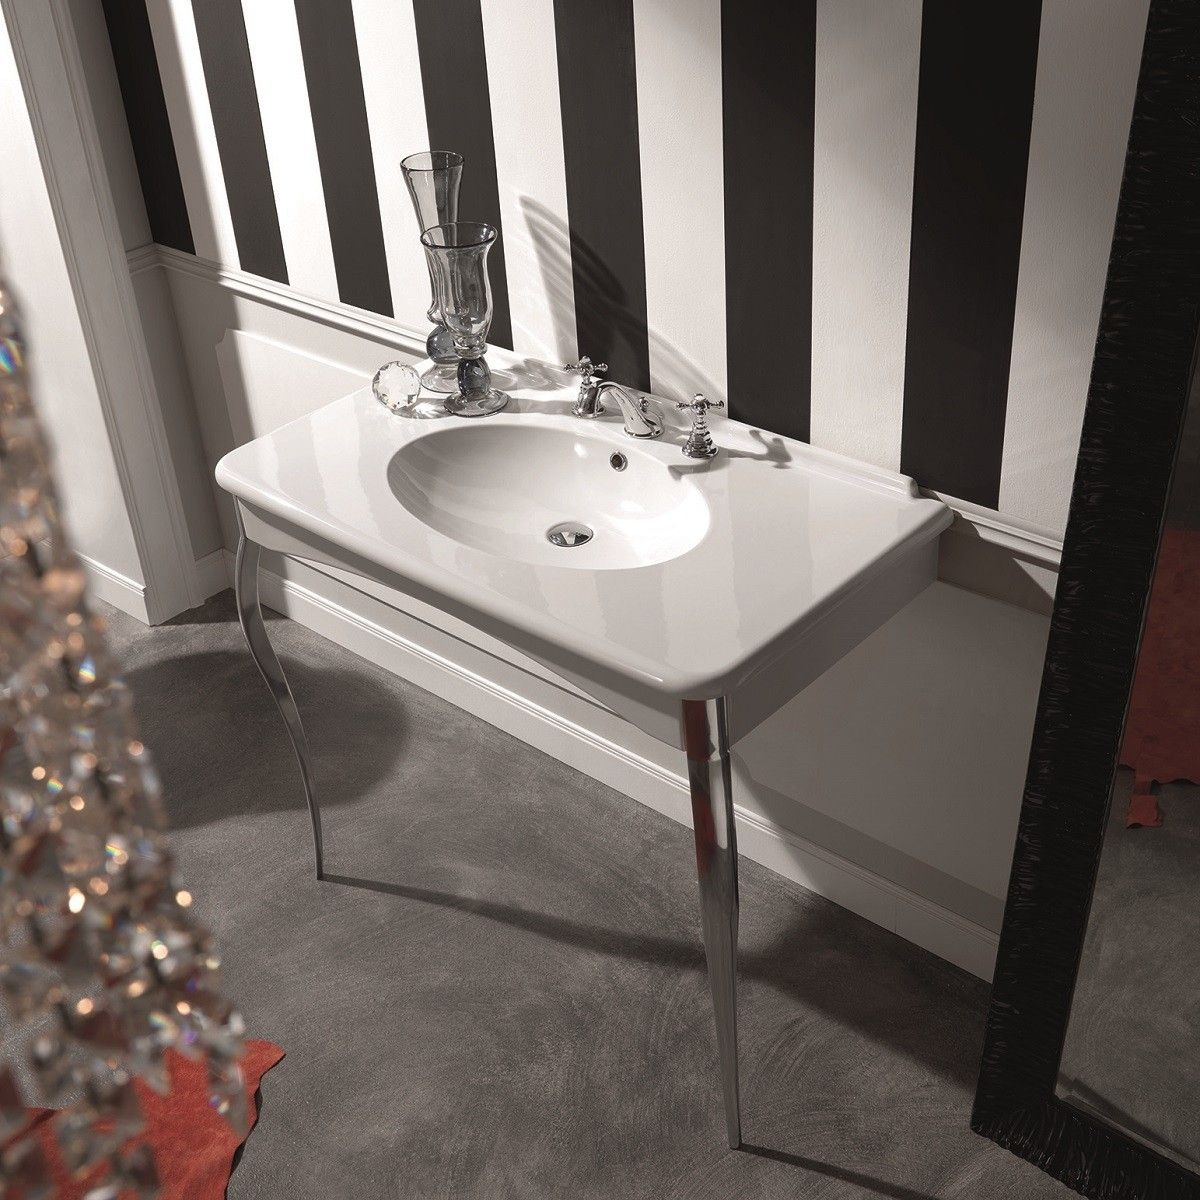 Wall Mount Bathroom Sink With Chrome Legs